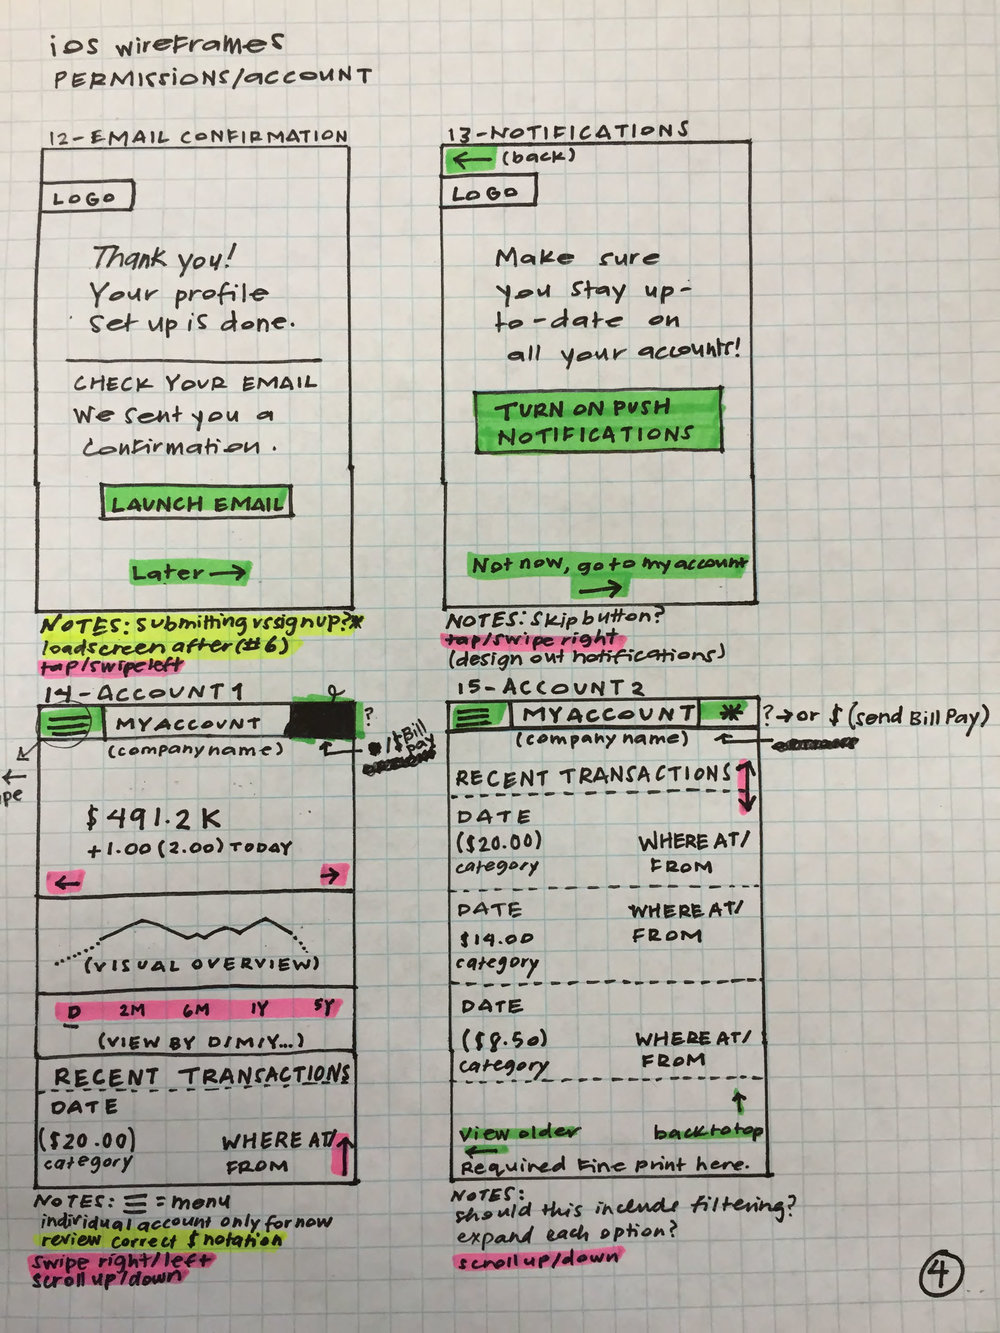 SEED_iOS_Wireframe_RI_Page_5.jpg